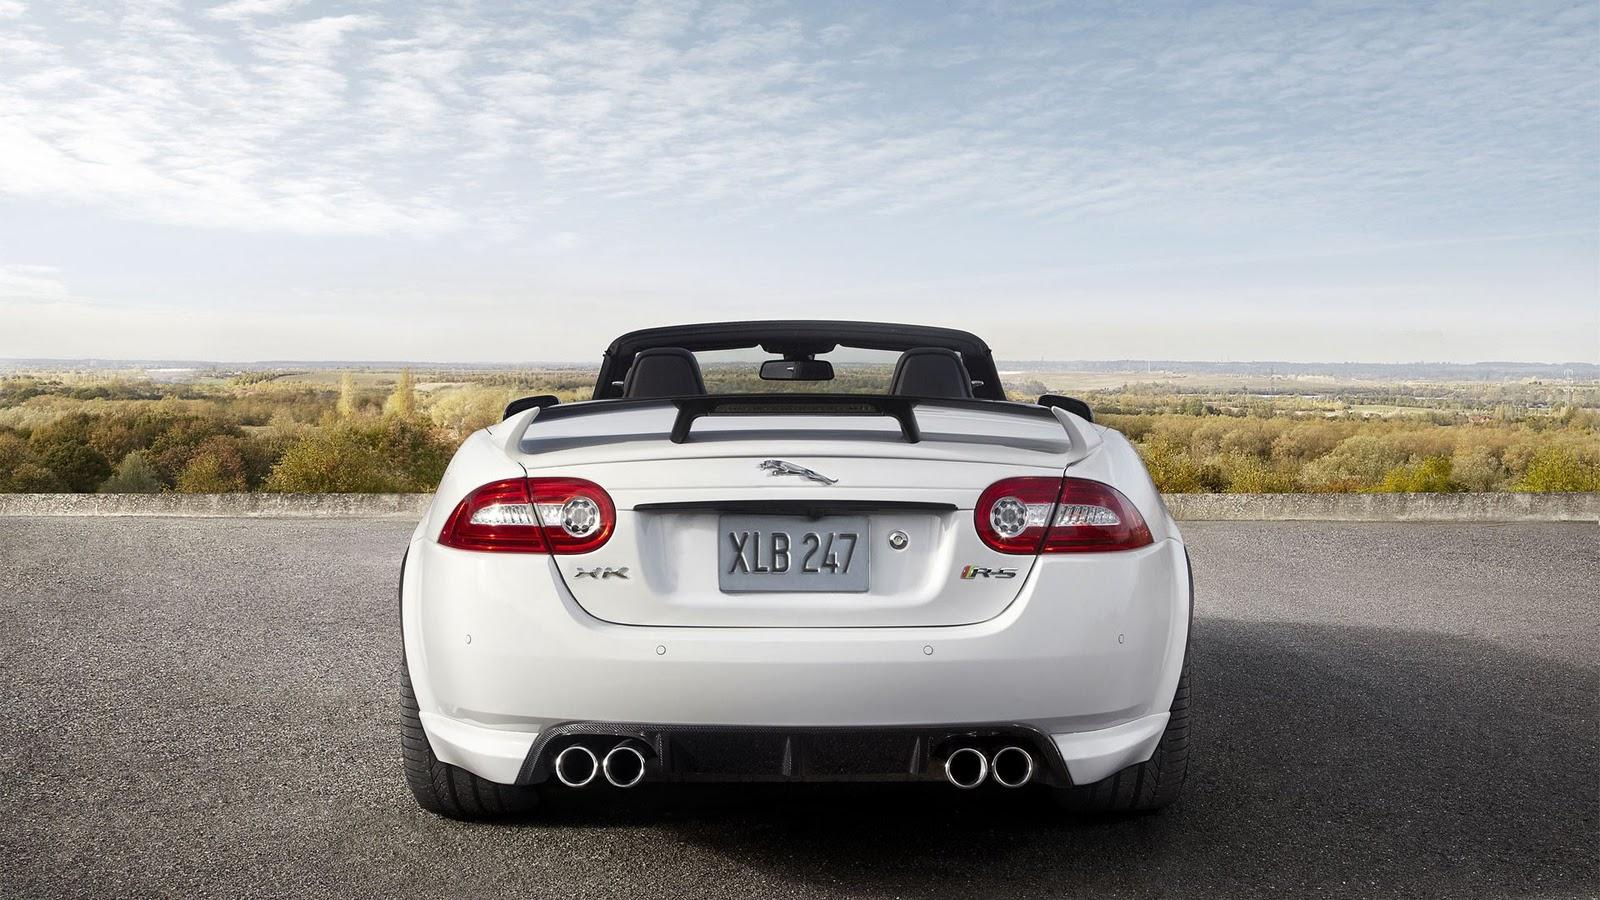 http://3.bp.blogspot.com/-g_Tkk2ISRIg/TsjYMlOdUpI/AAAAAAAAAfE/HZU0uxUzedQ/s1600/2013+Jaguar+C-X16+20.jpg